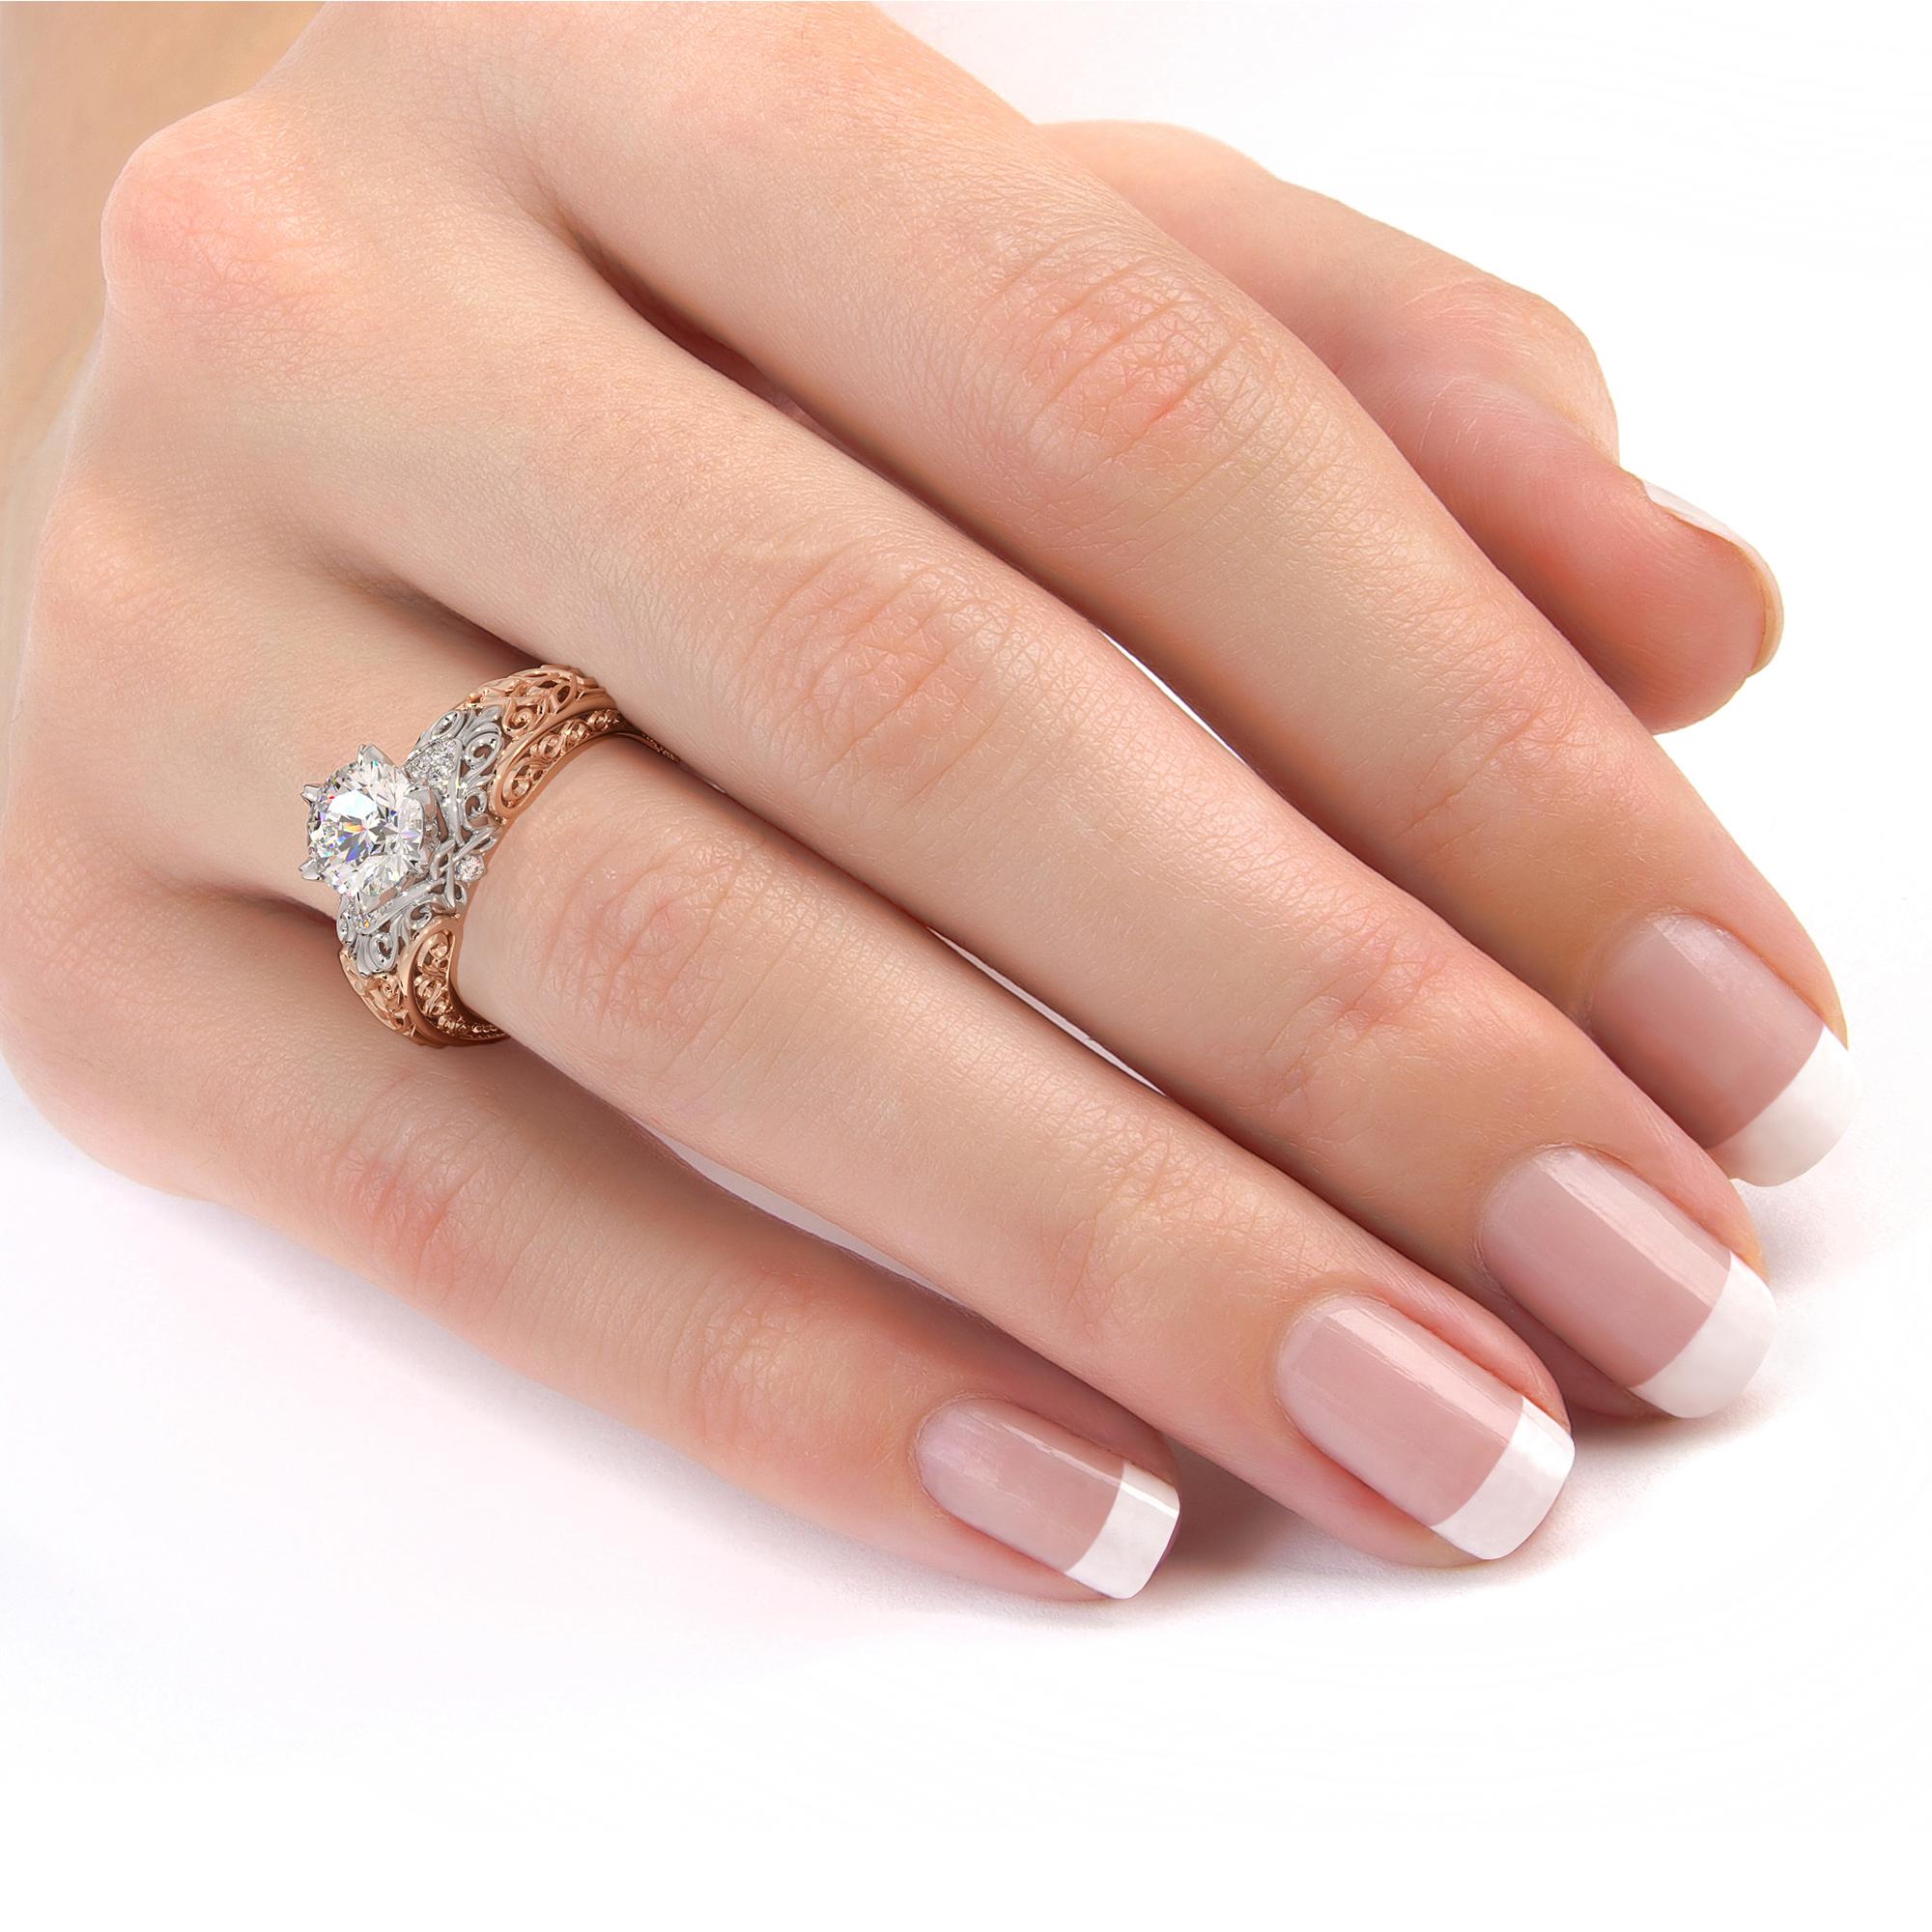 Eternal Two Tone Moissanite Engagement Ring